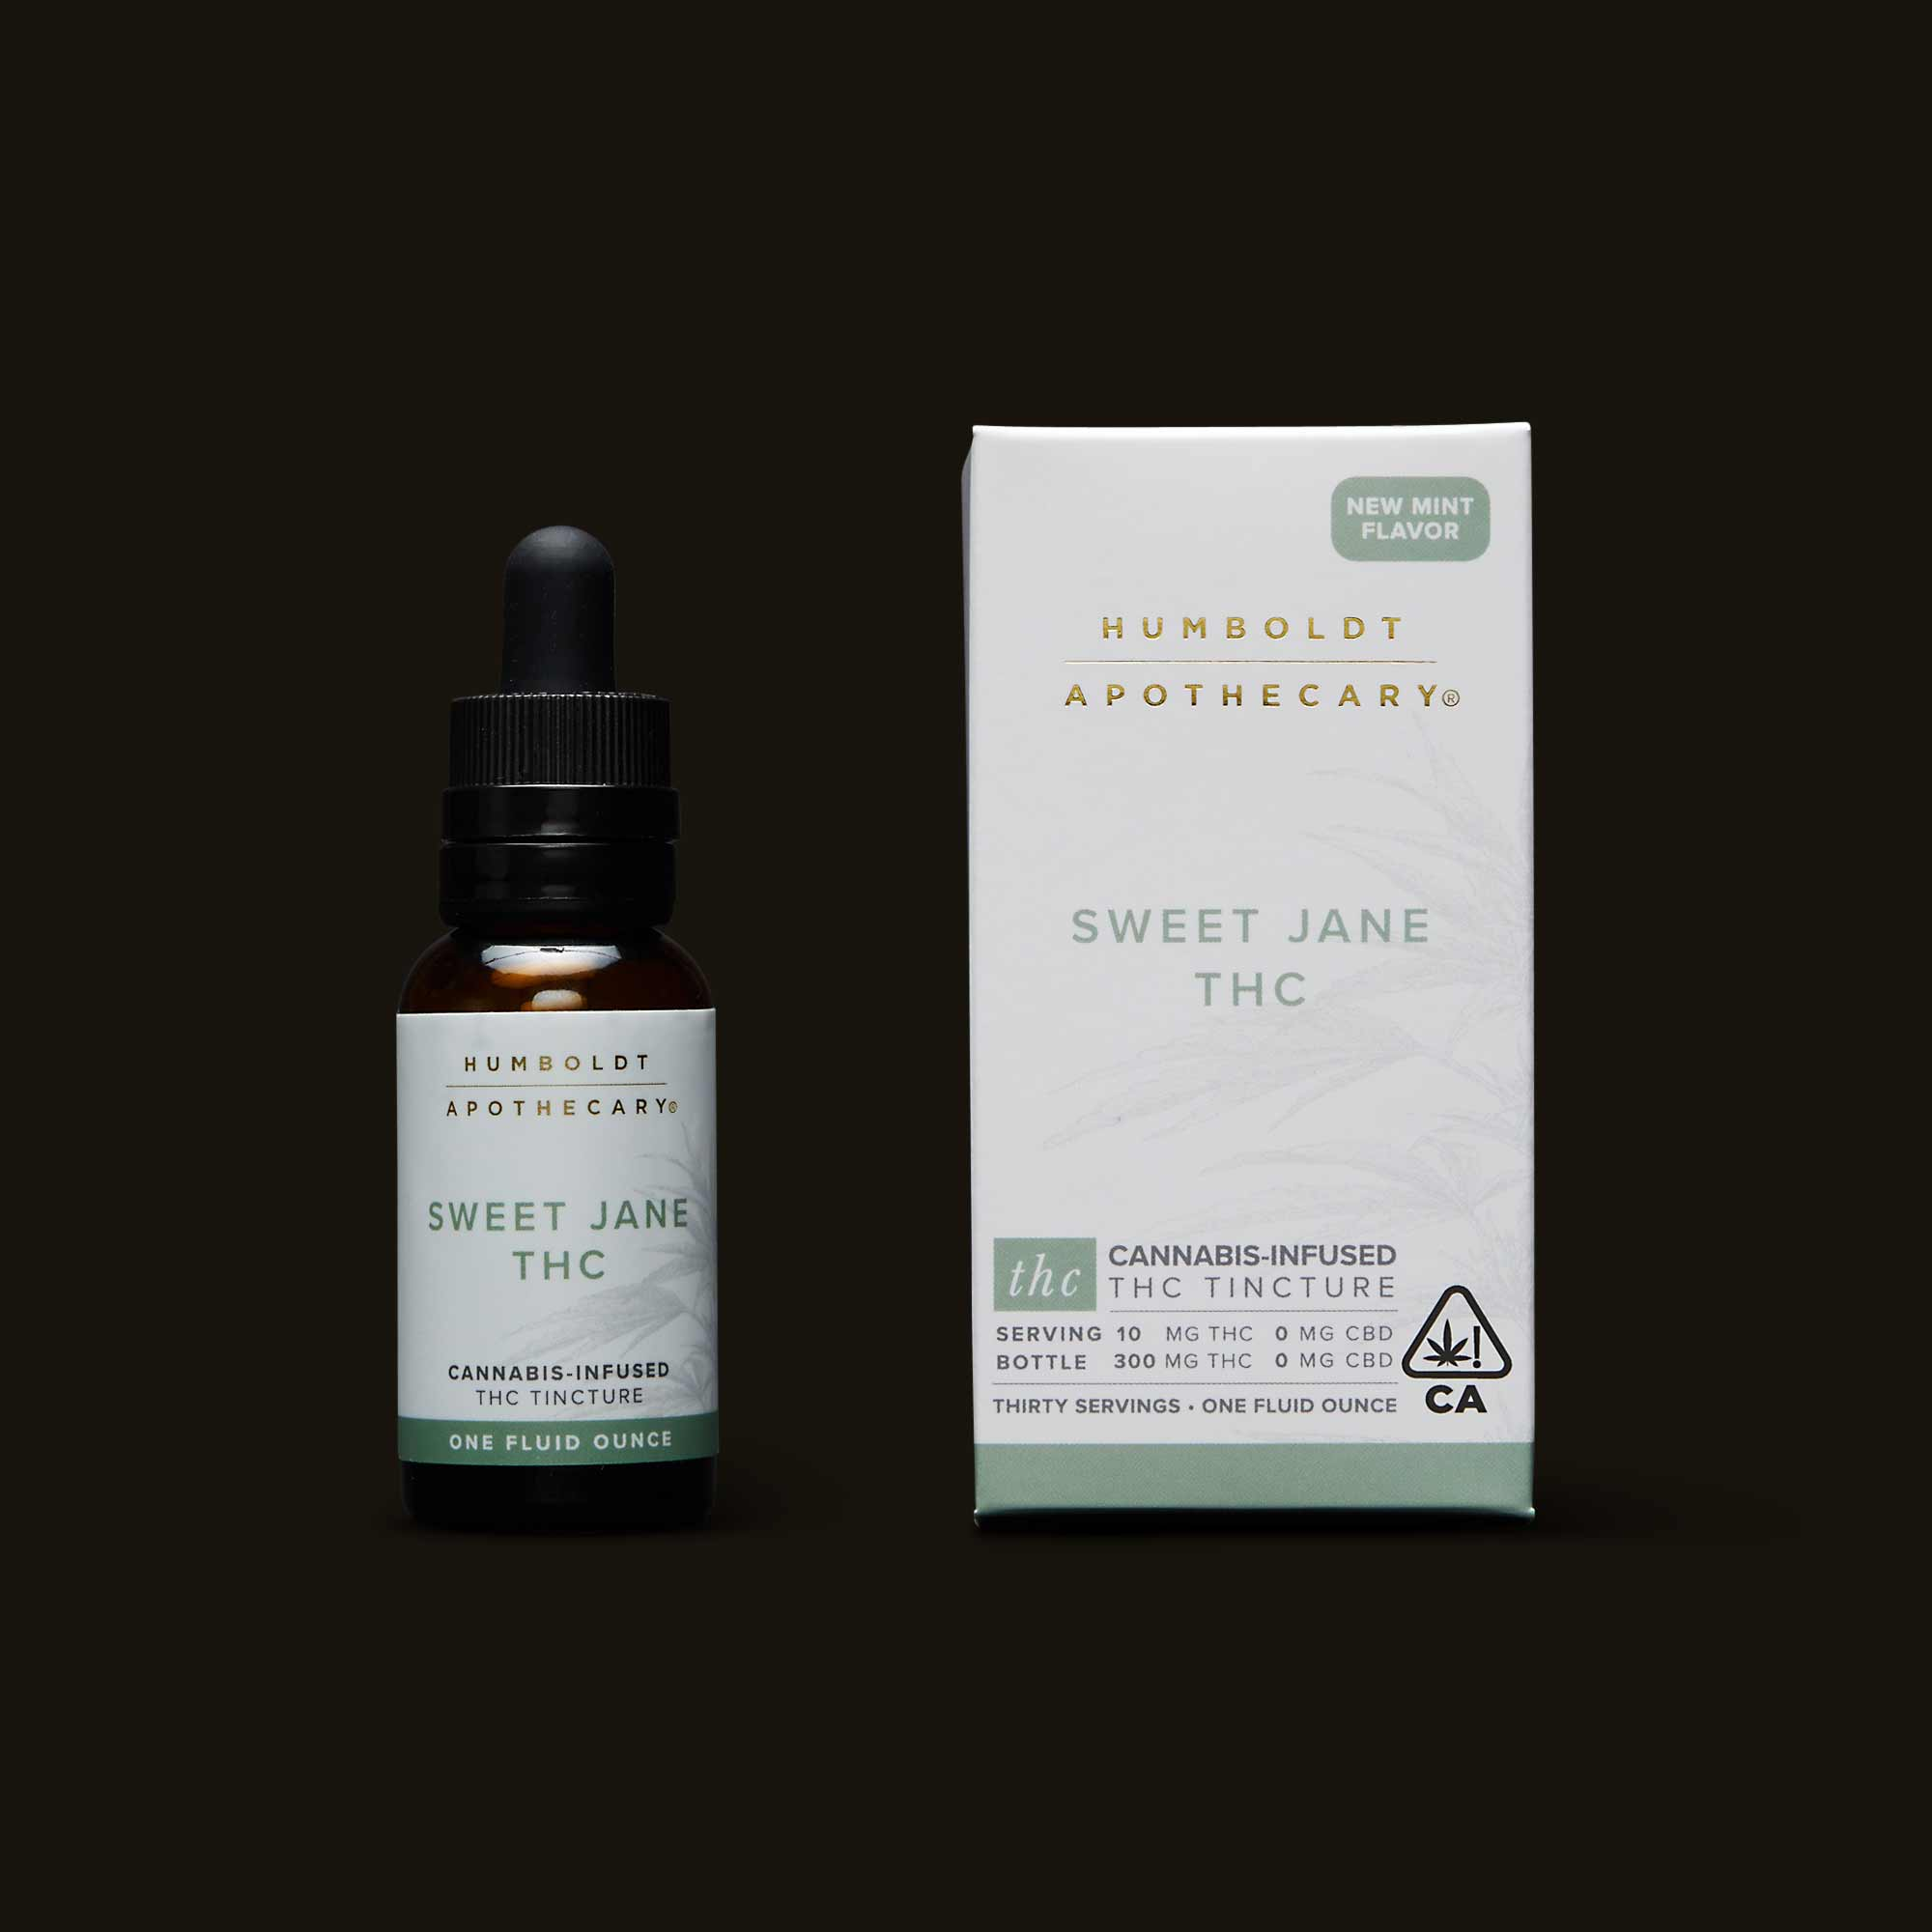 Humboldt Apothecary Sweet Jane THC